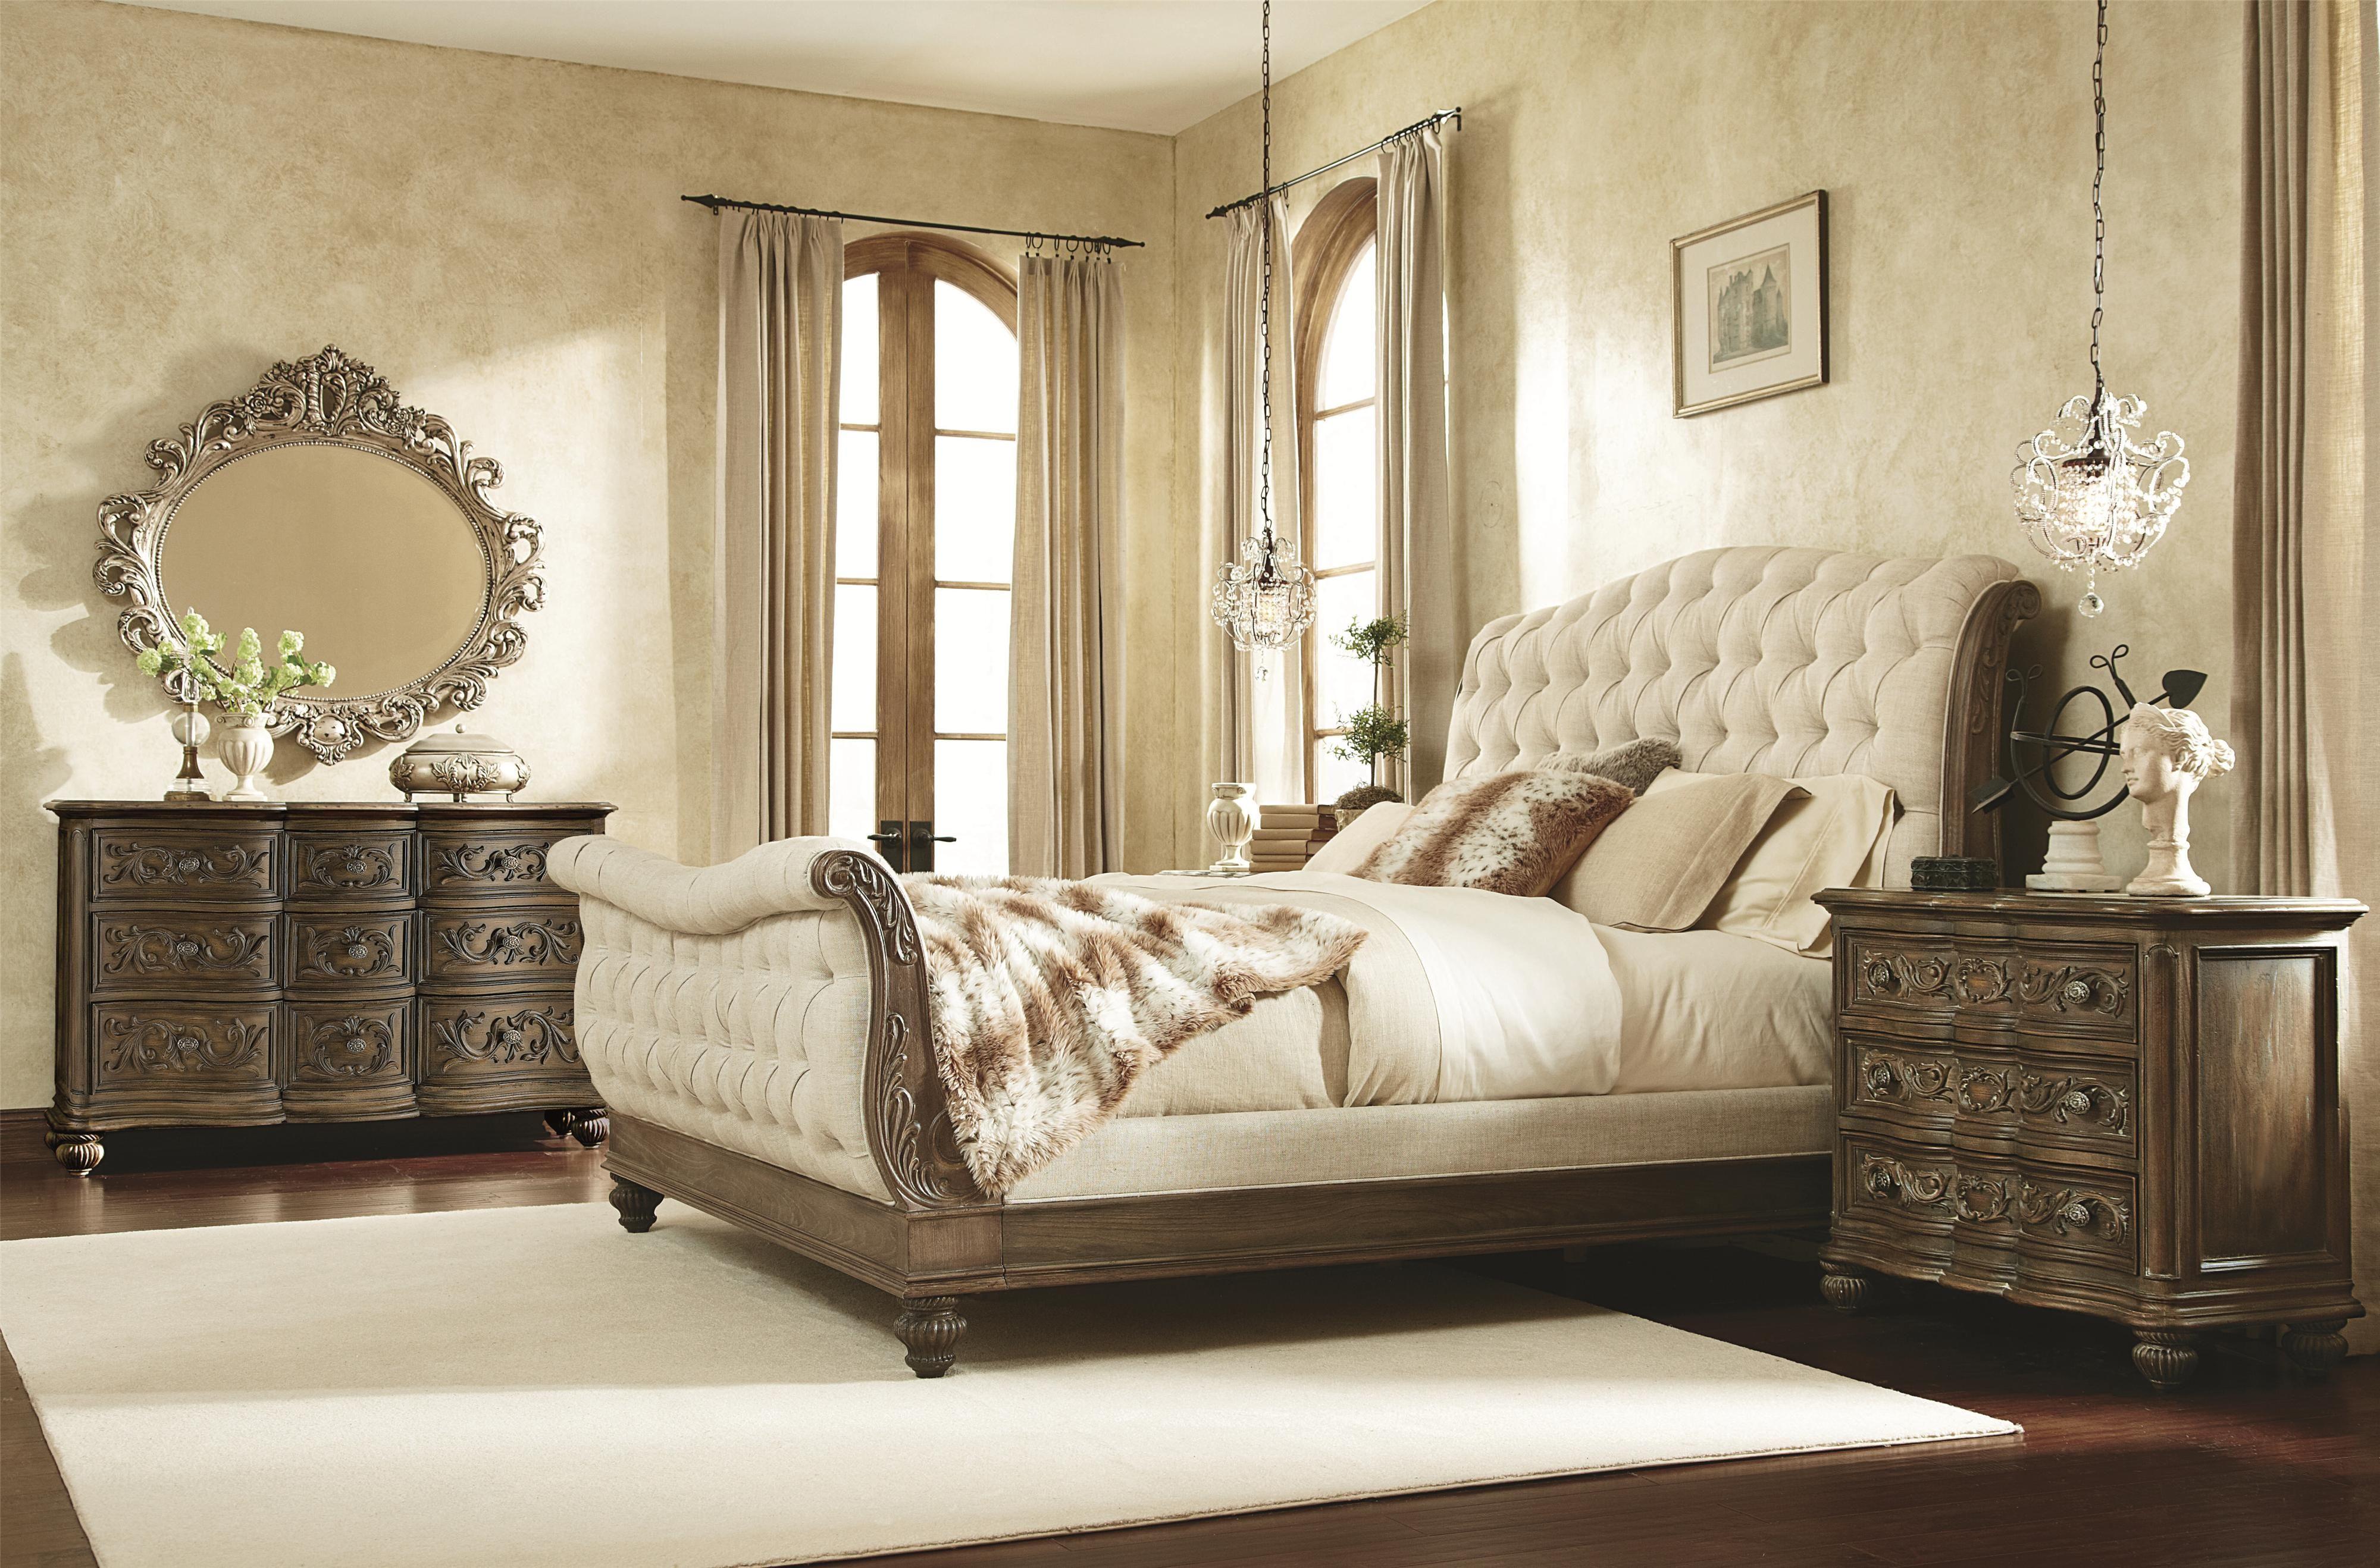 Furniture barnjessica mcclintock home the boutique collection